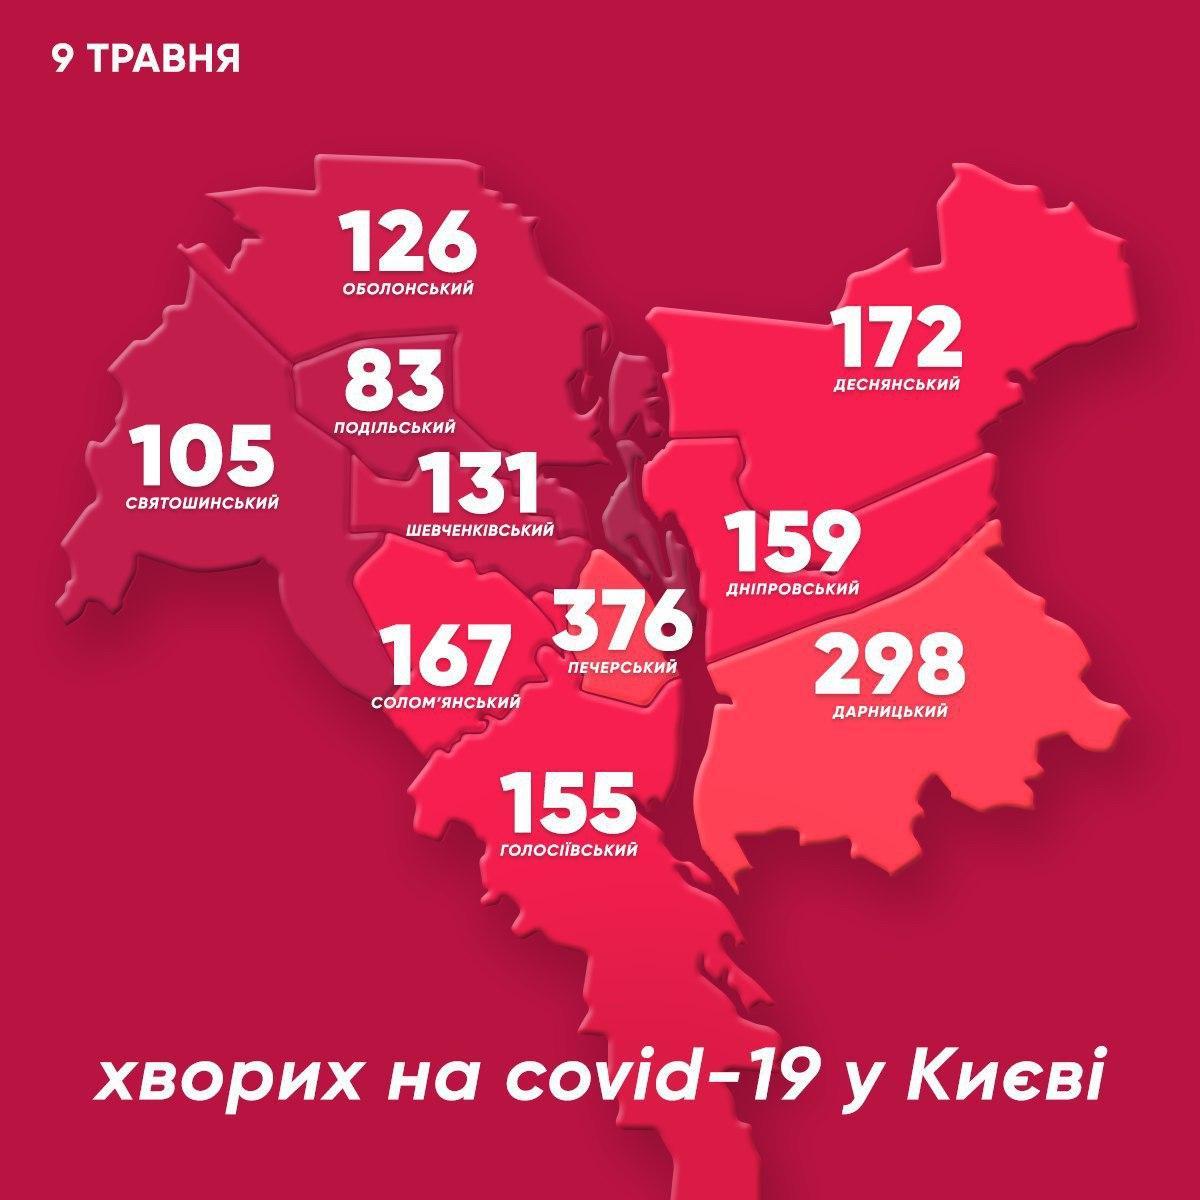 Коронавирус в Киеве - статистика и карта на 9 мая / телеграм-канал Виталия Кличко